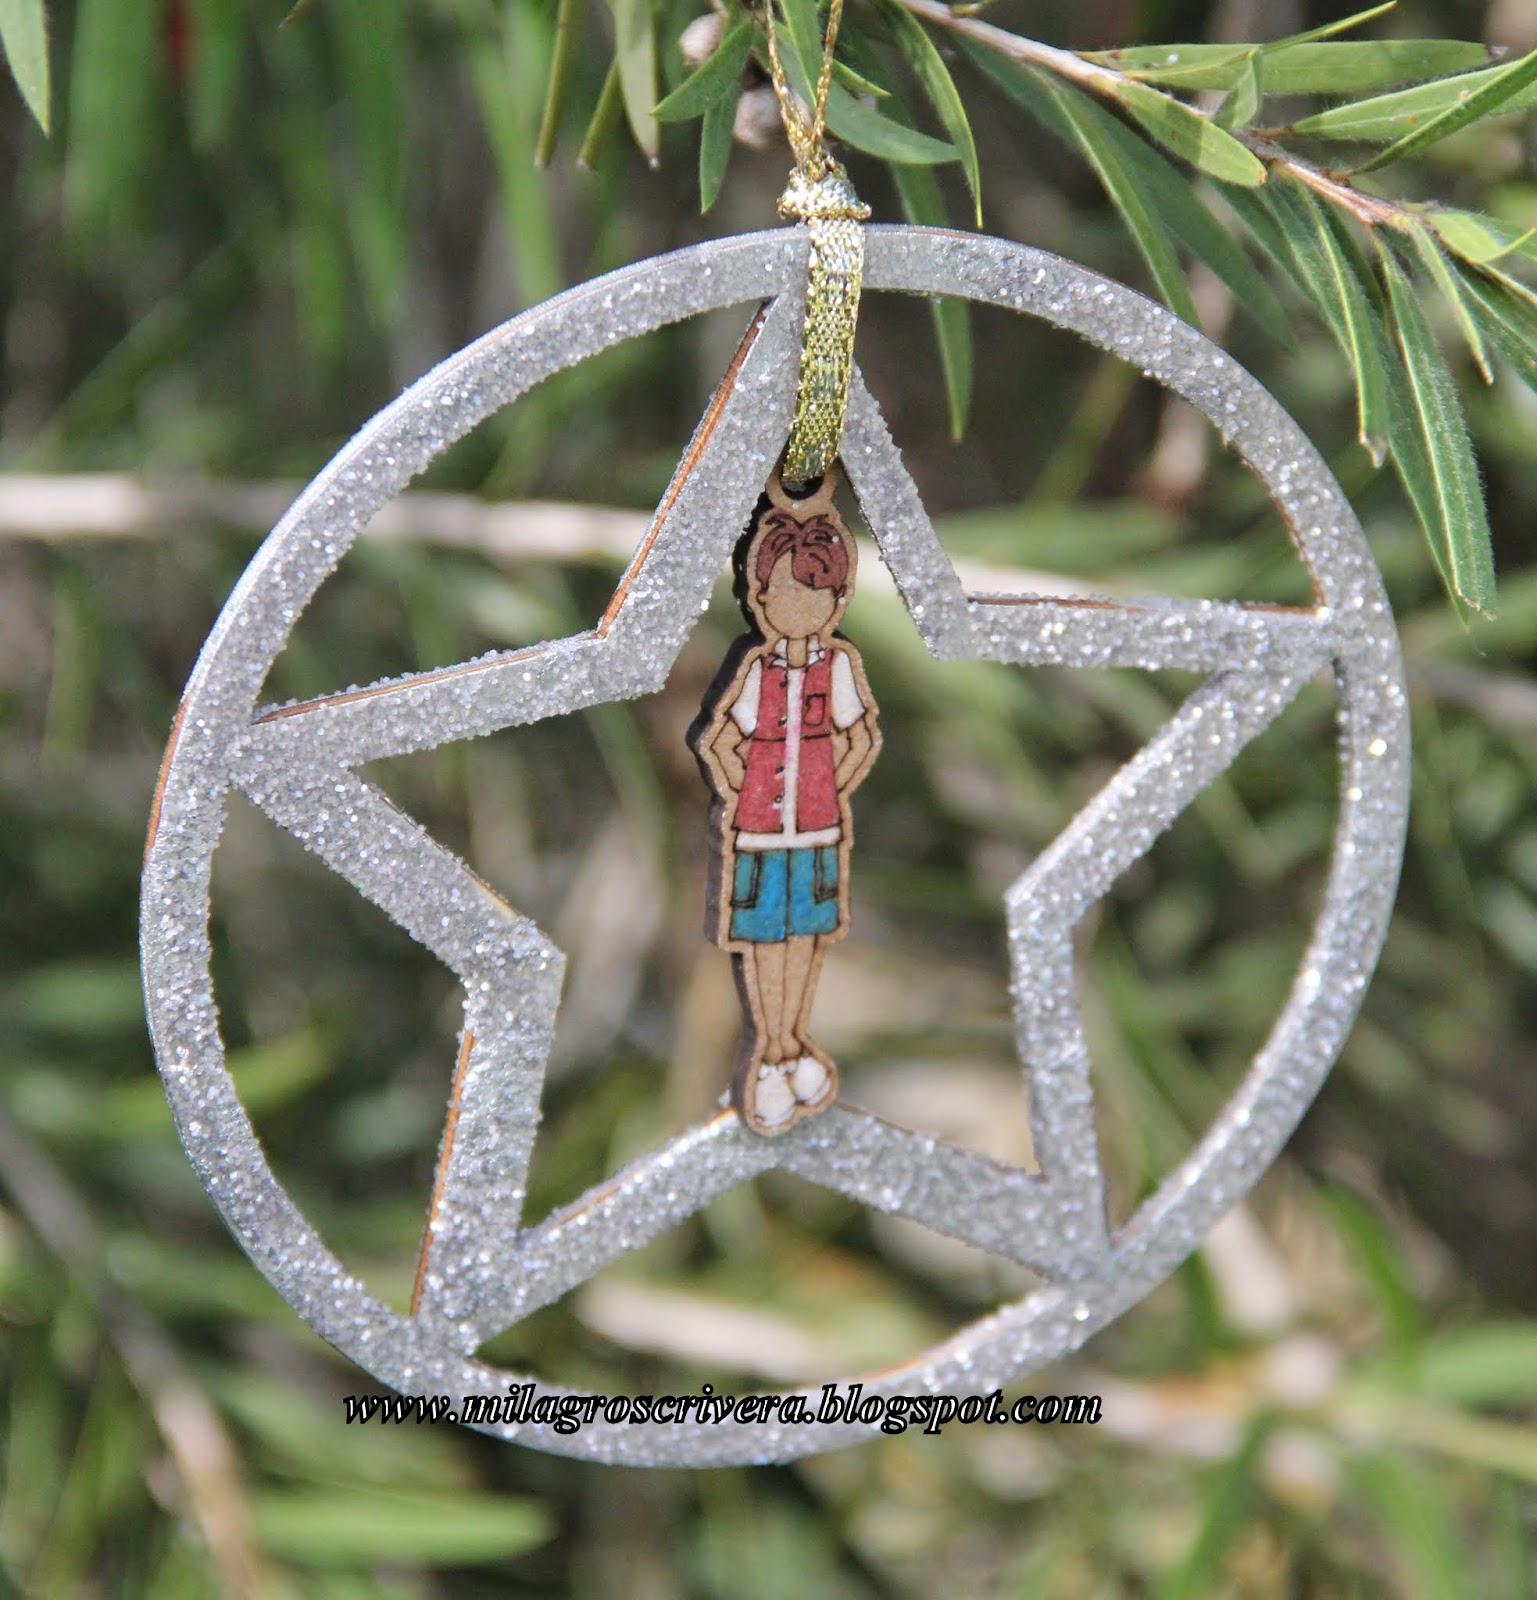 http://milagroscrivera.blogspot.com/2014/12/julie-nutting-mini-doll-christmas_24.html